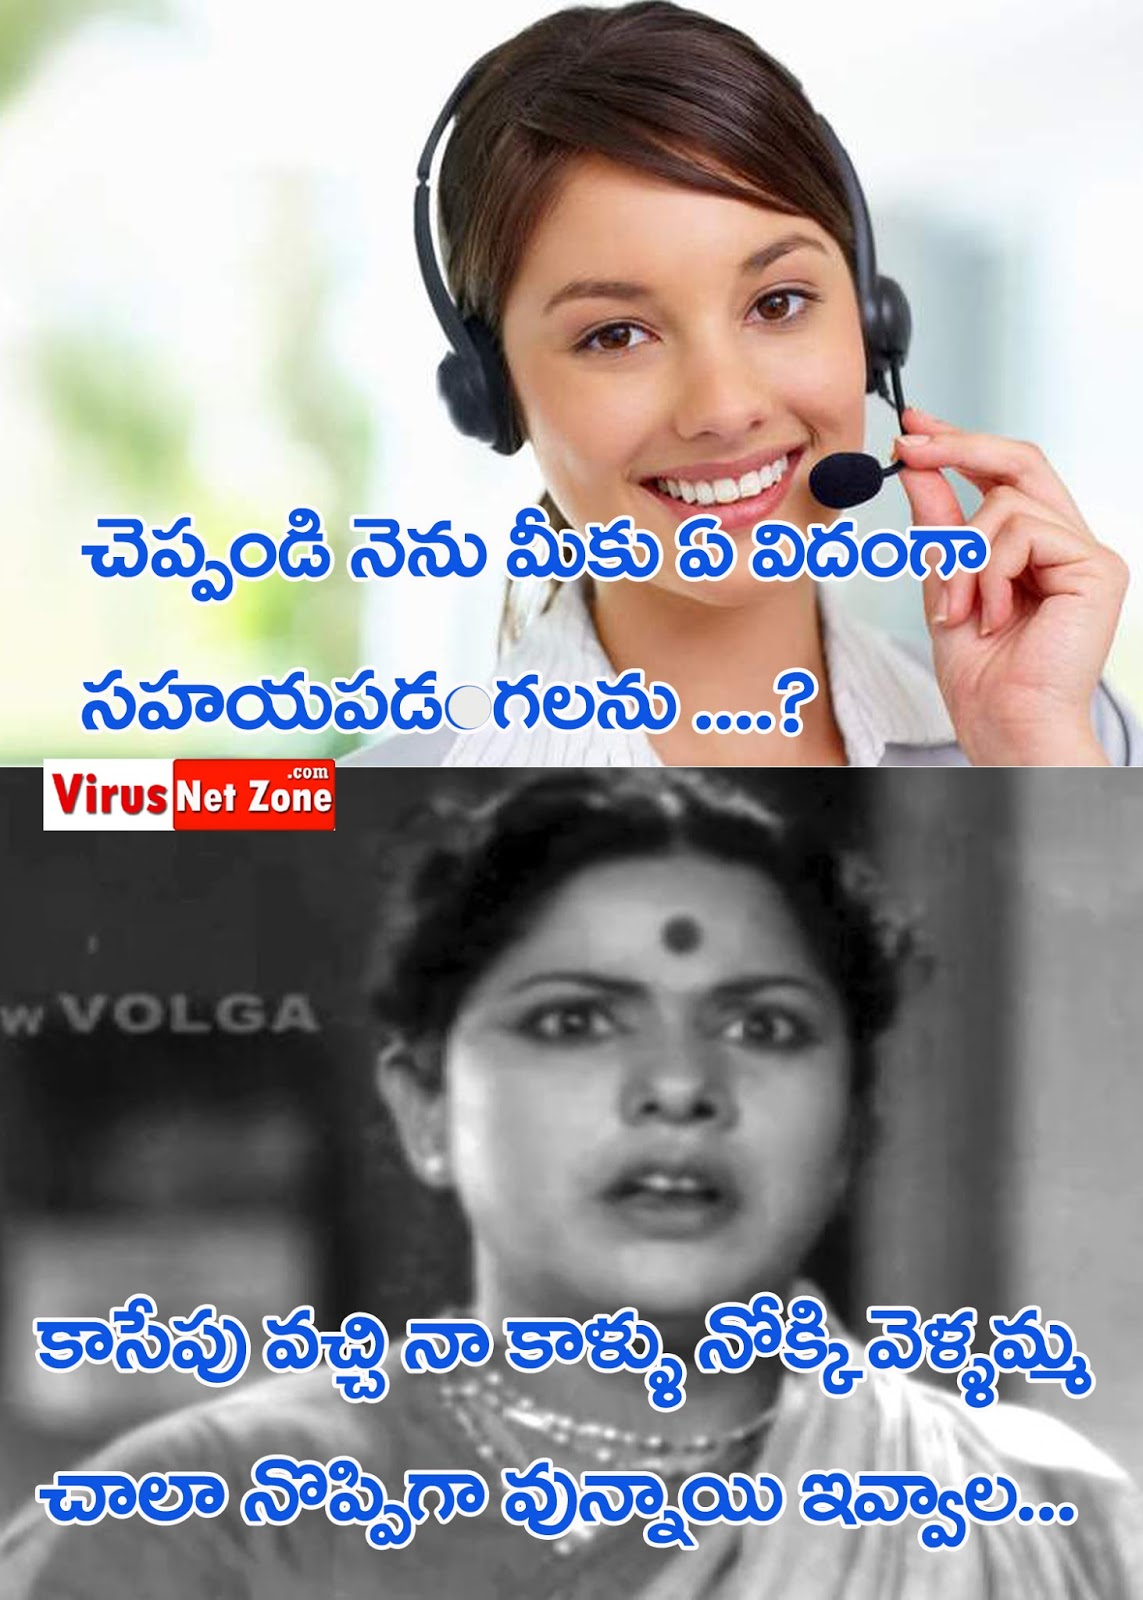 Telugu Funny jokes images   Telugu latest jokes images